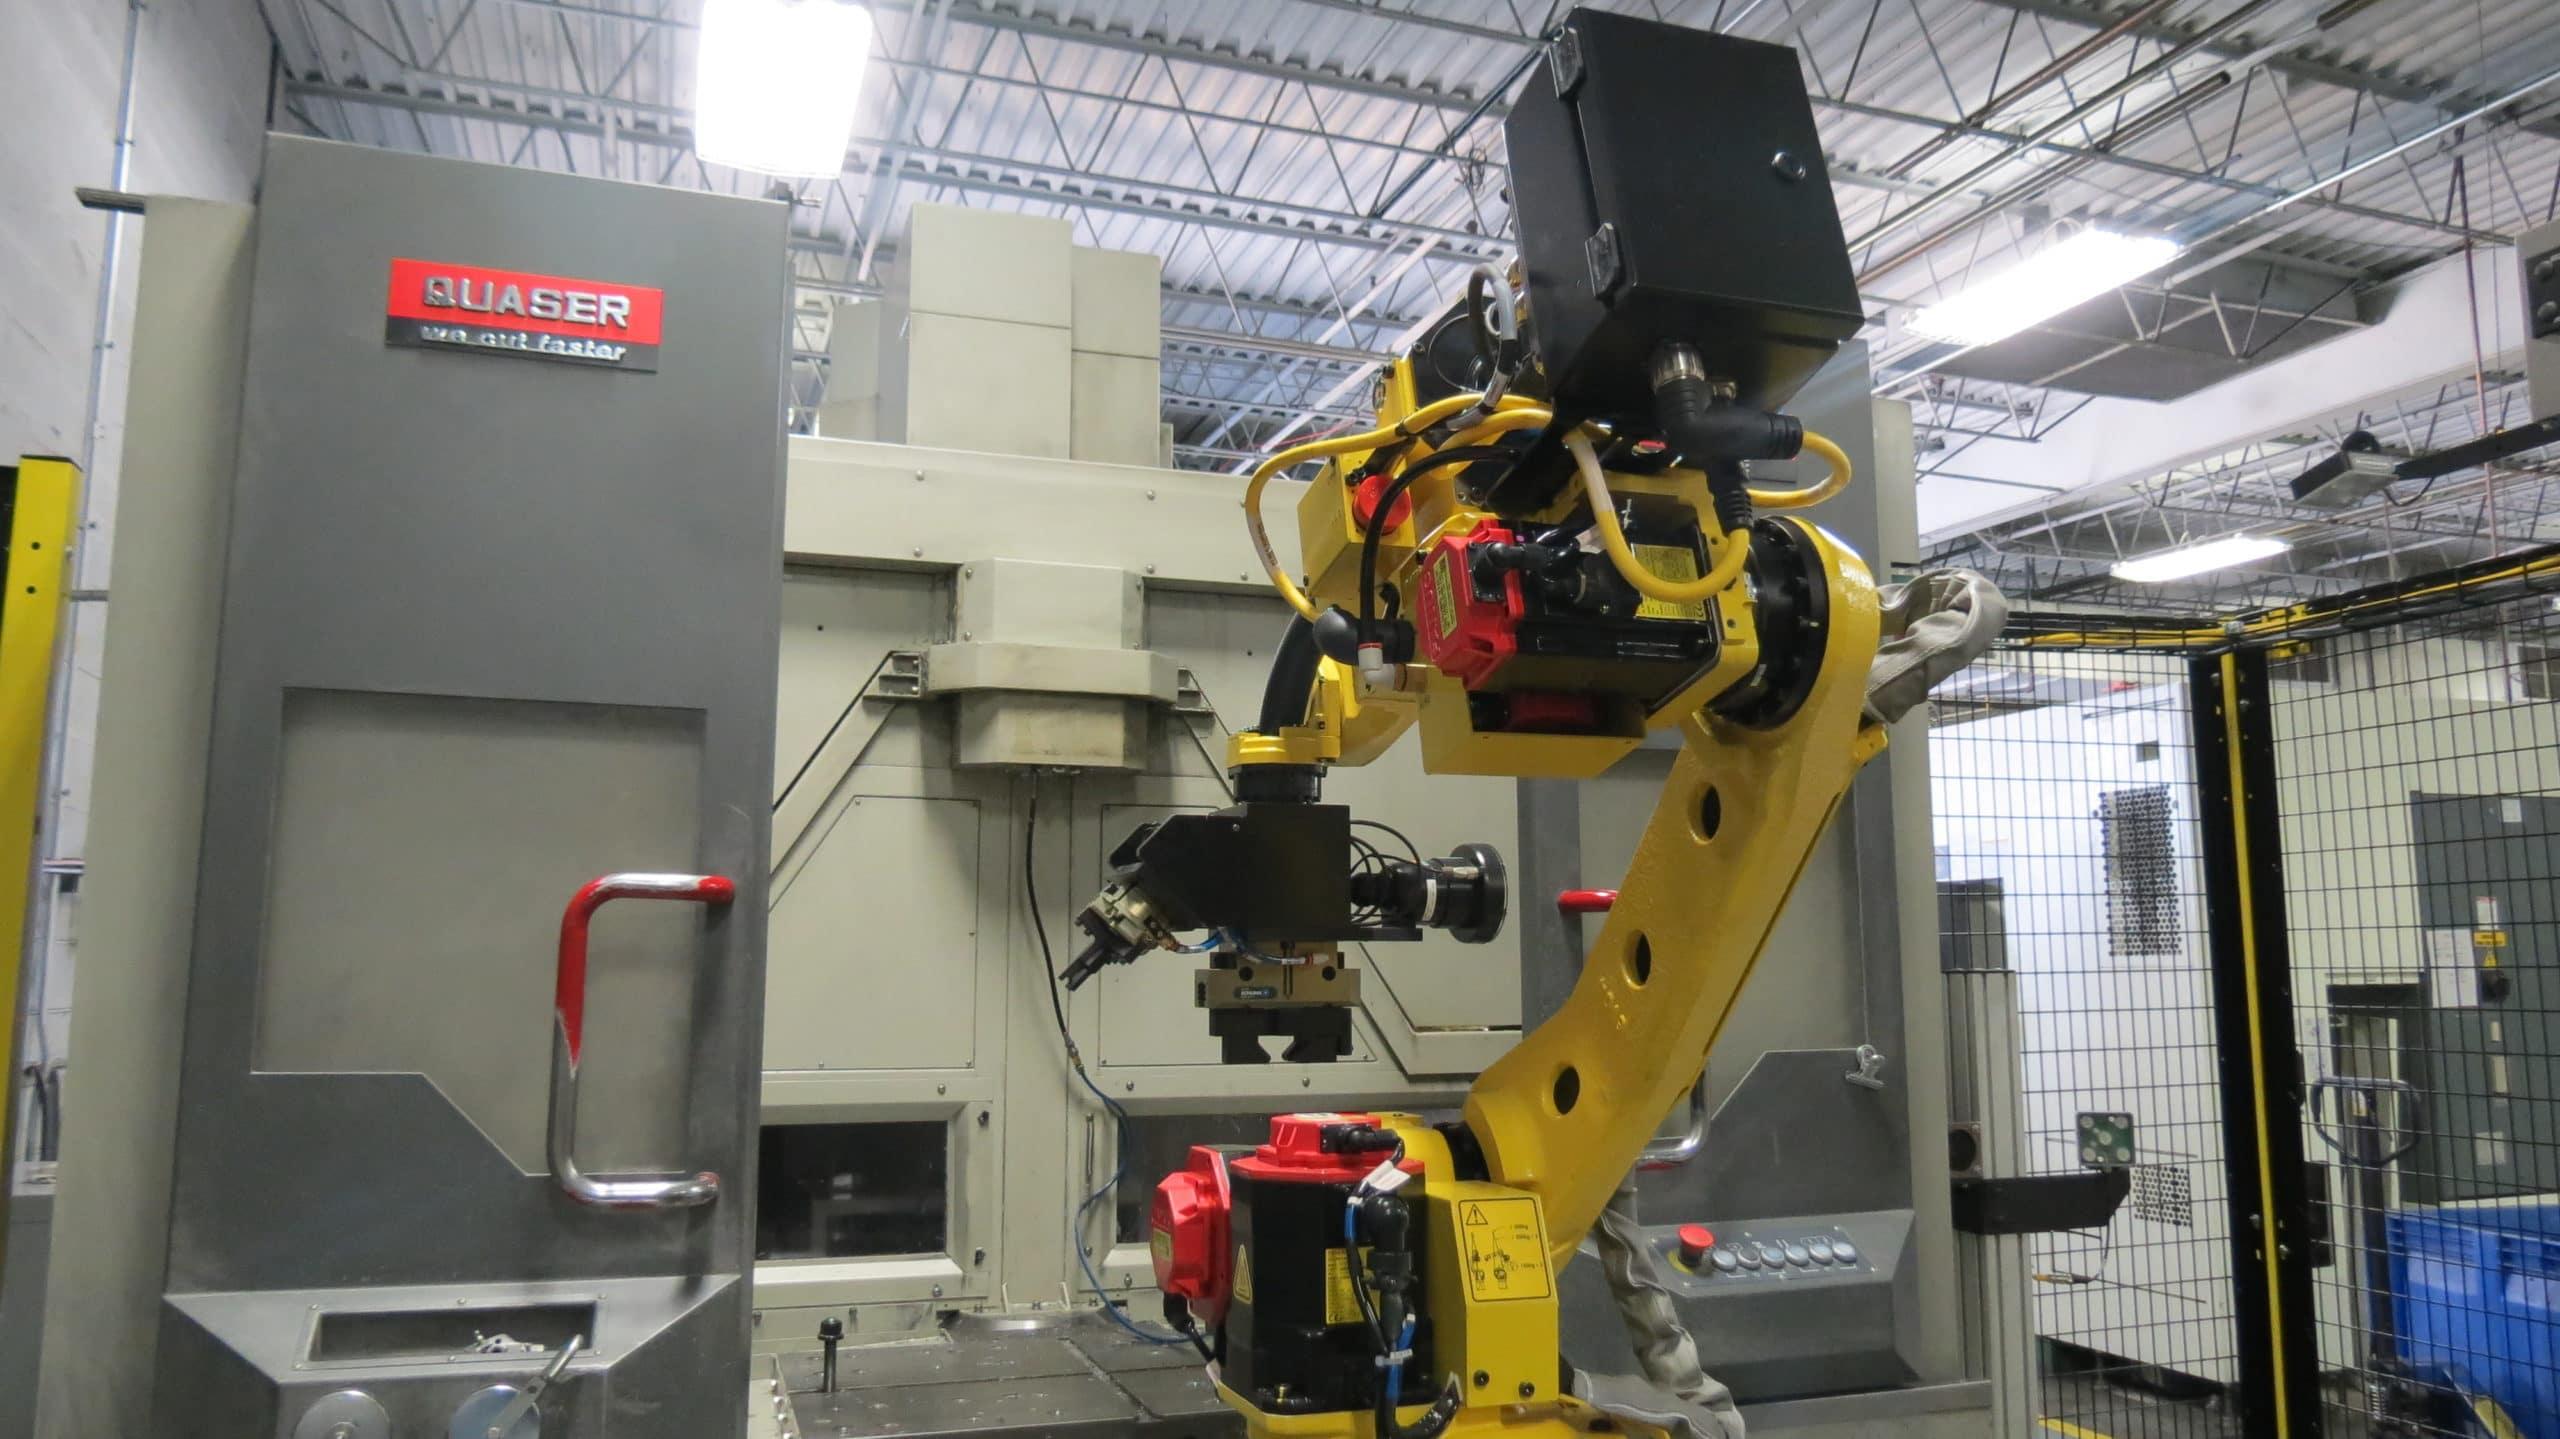 FANUC CNC Robot die casting